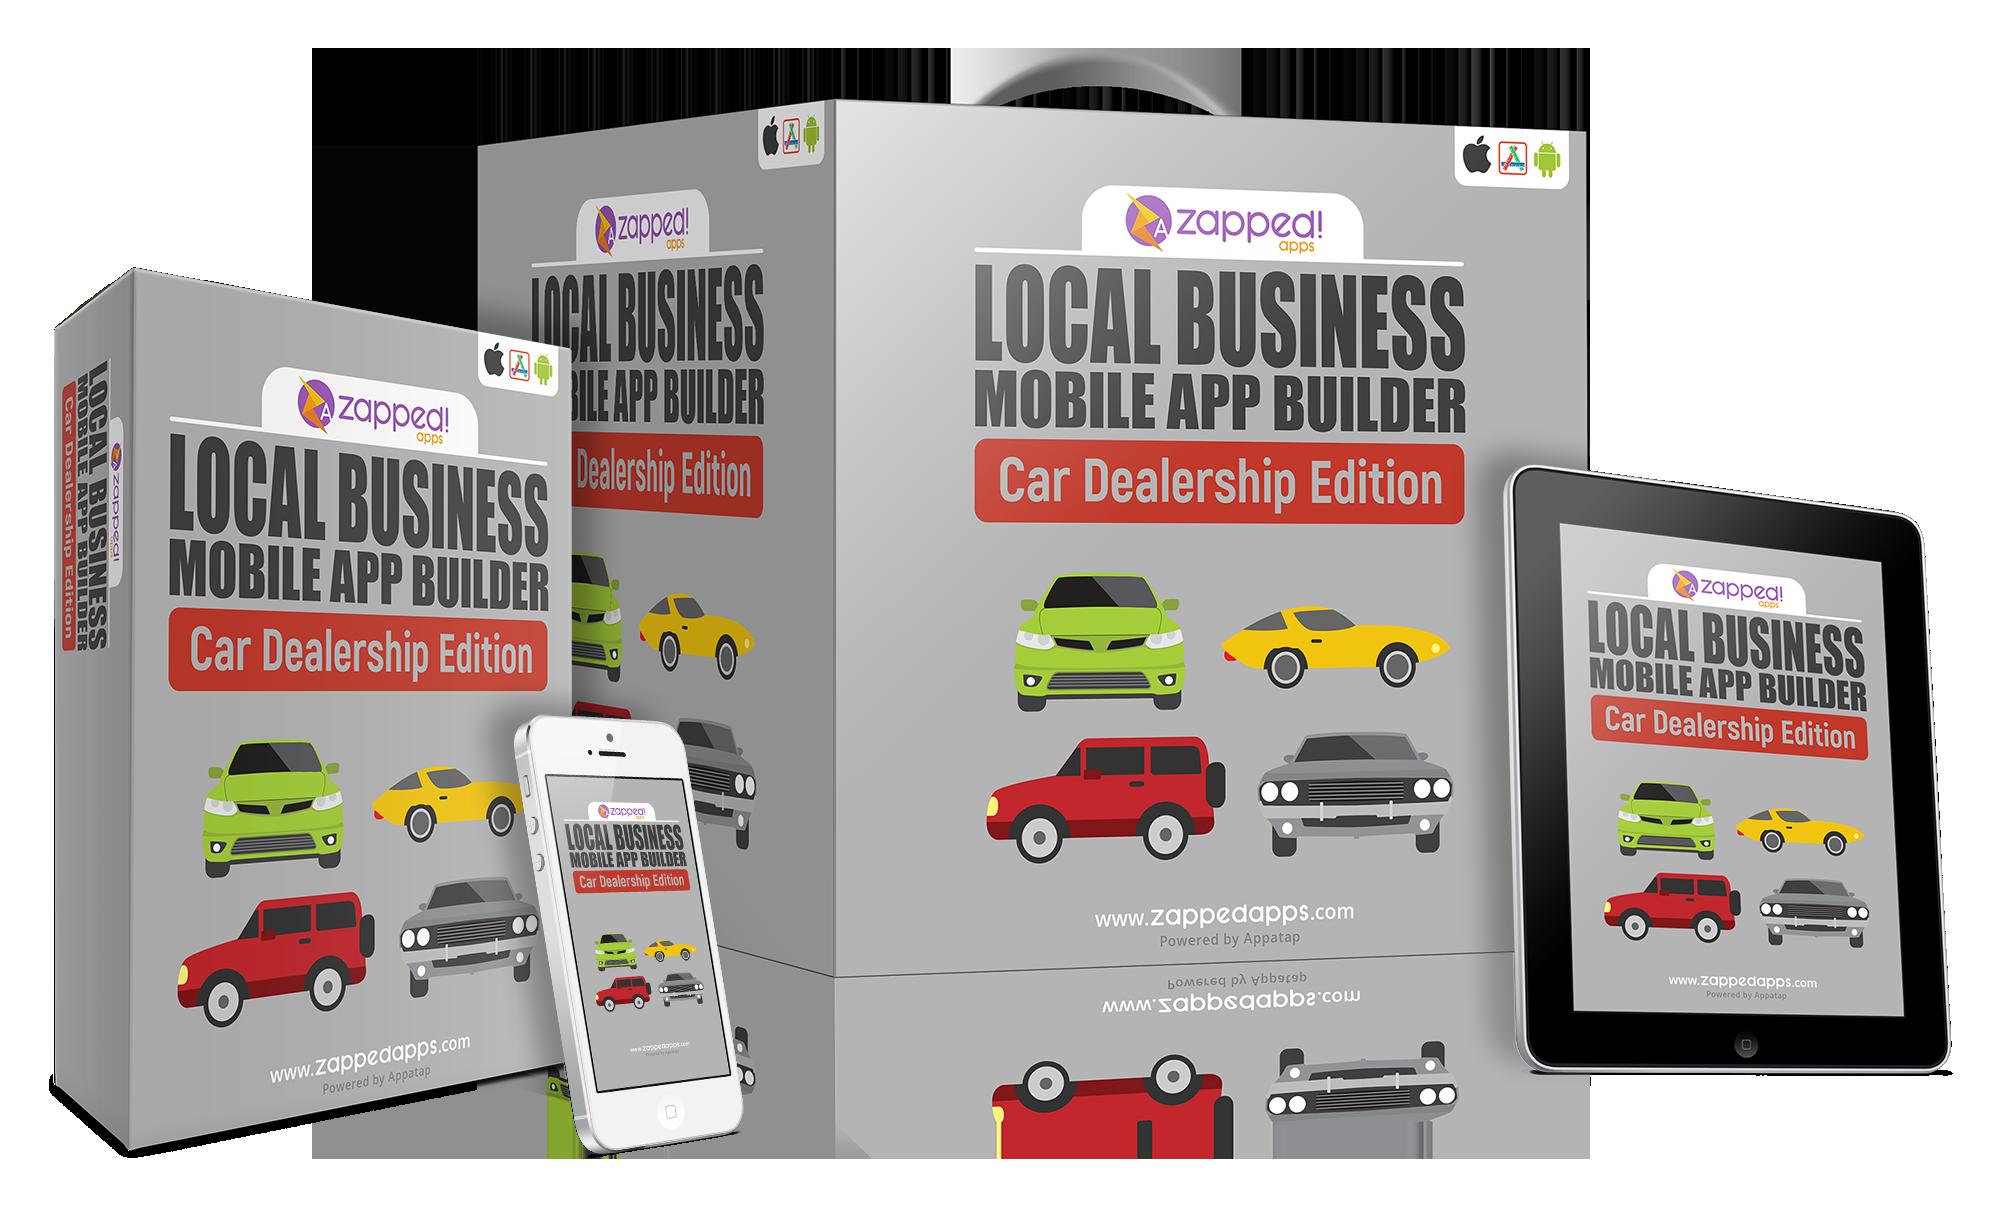 Local Biz Mobile App Builder Car Dealership Edition Ian del